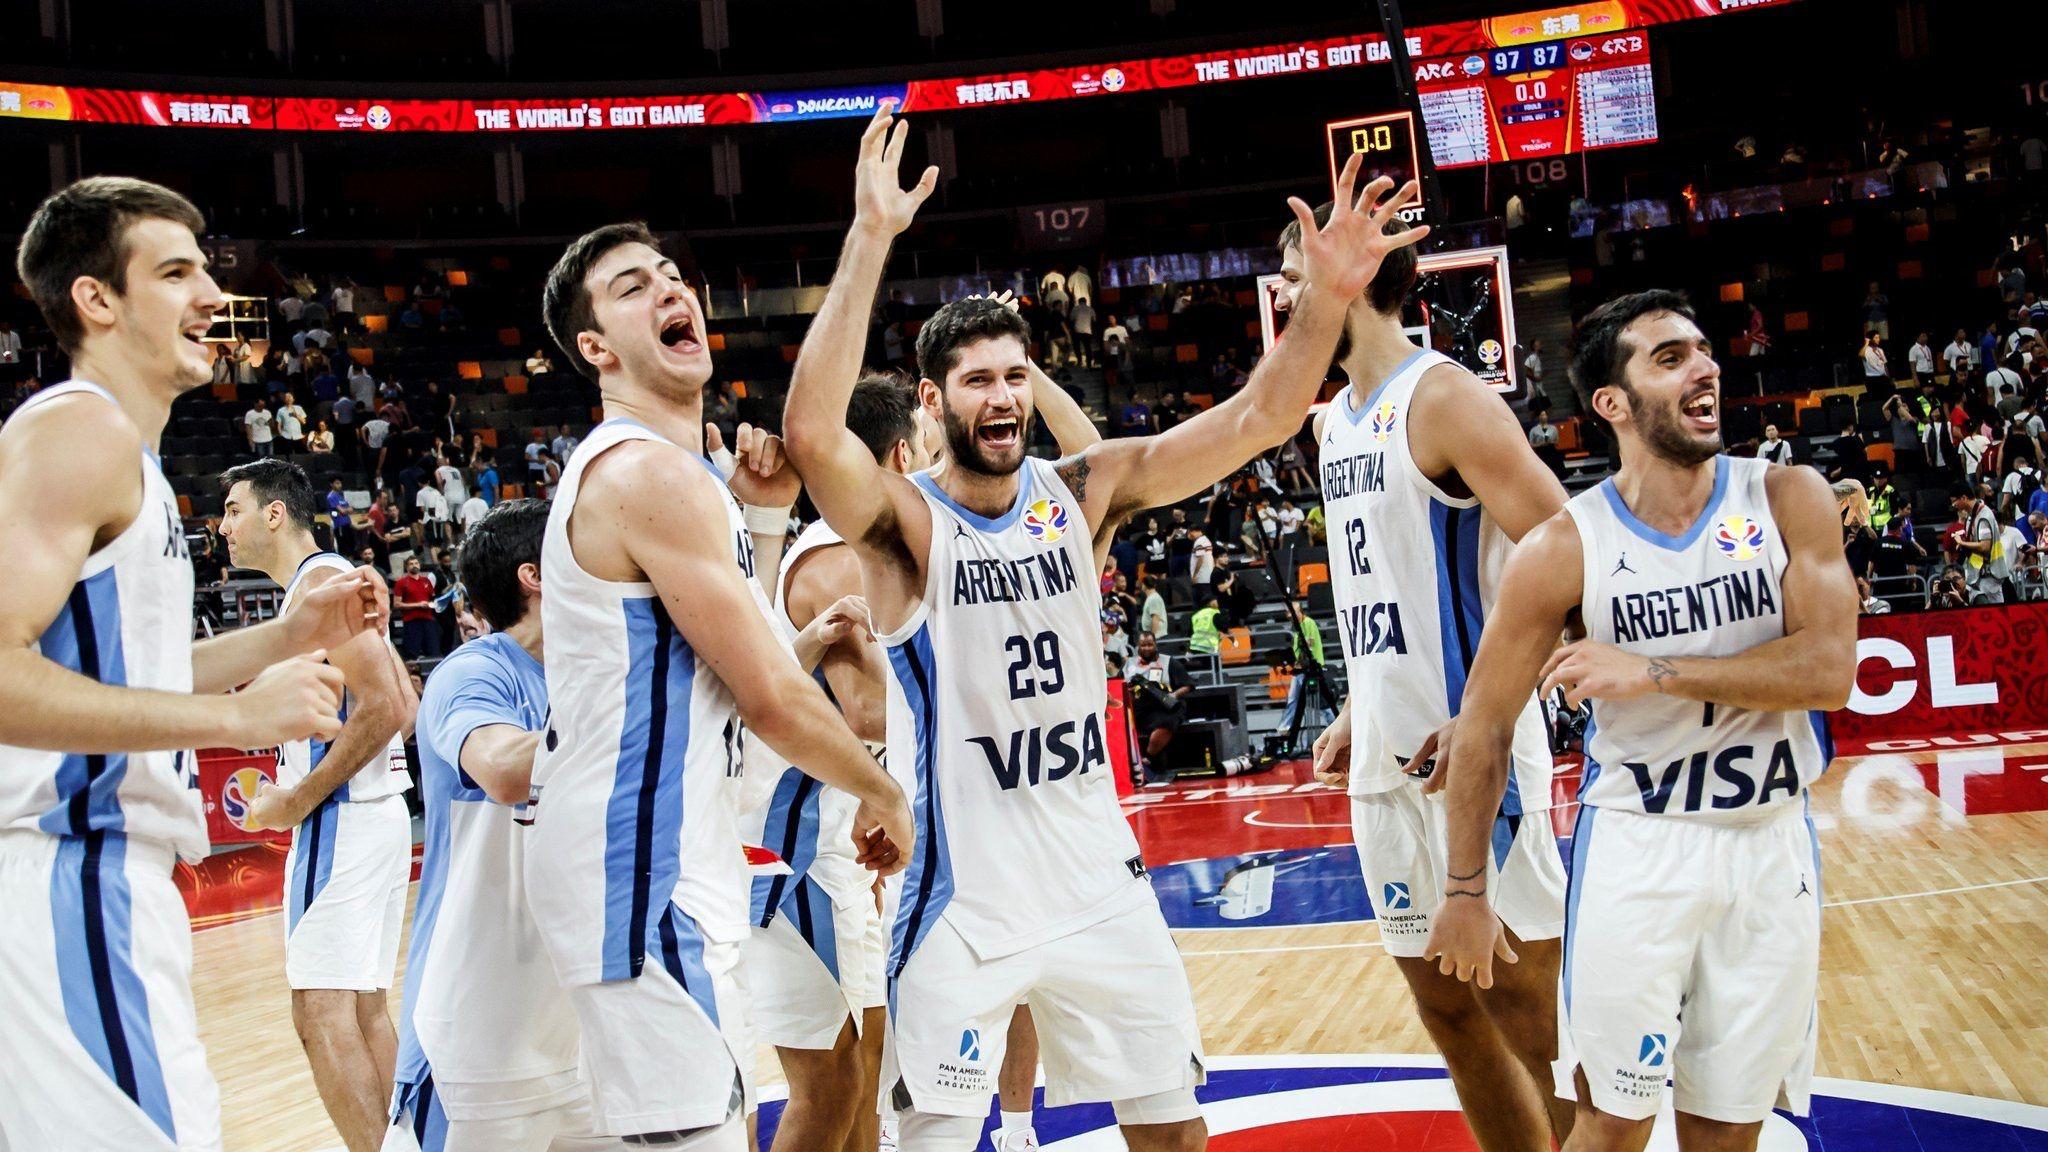 argentina fibawc mondial basket china 2019